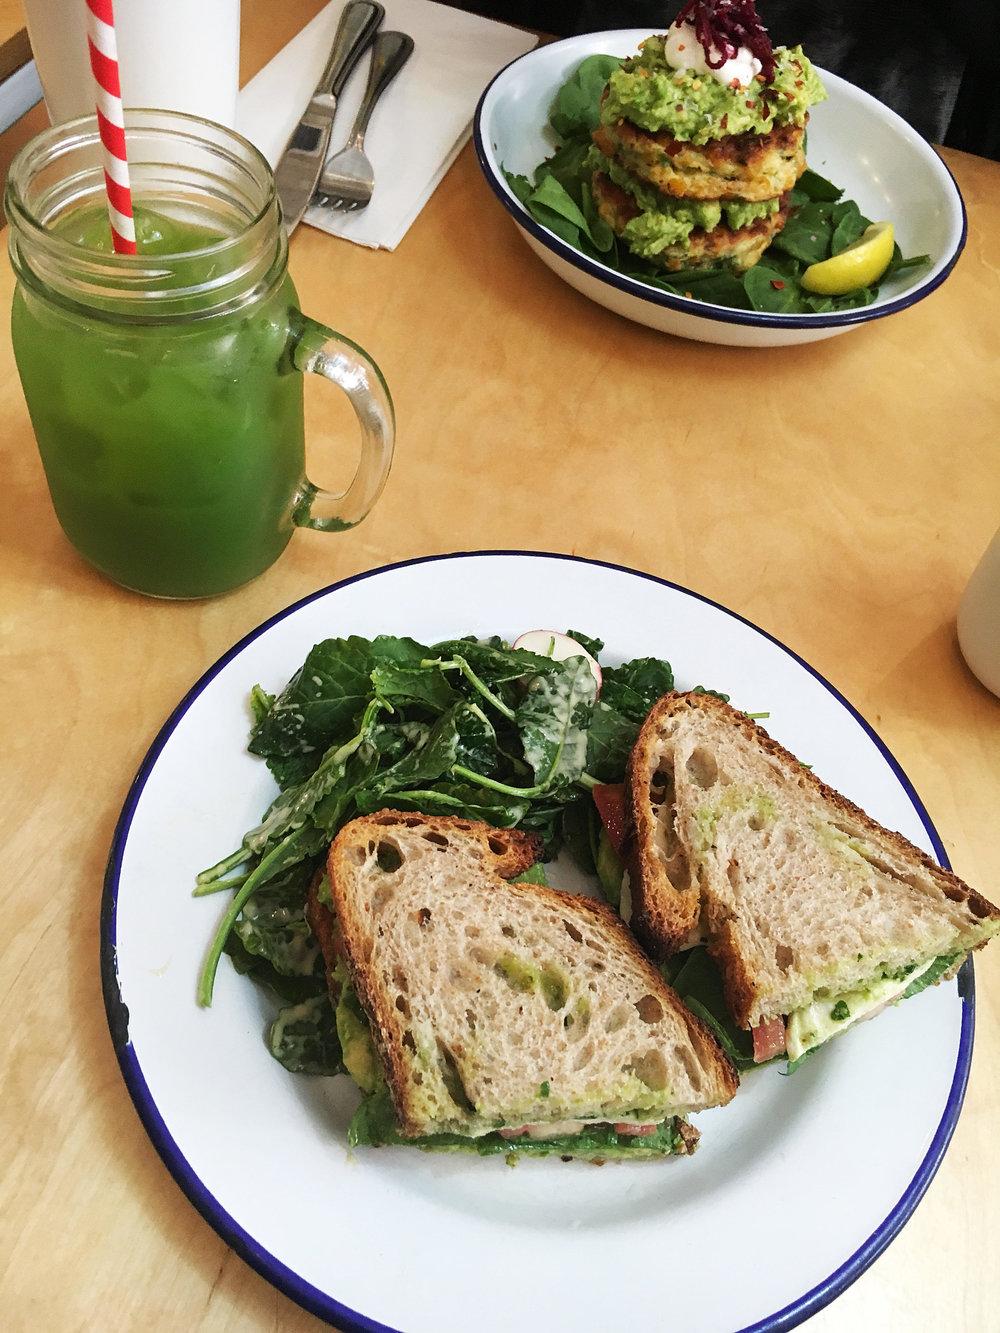 Verona sandwich: fresh tomato, avocado, watercress, mozzarella with basil pesto on bien cuit sourdough w/ side salad